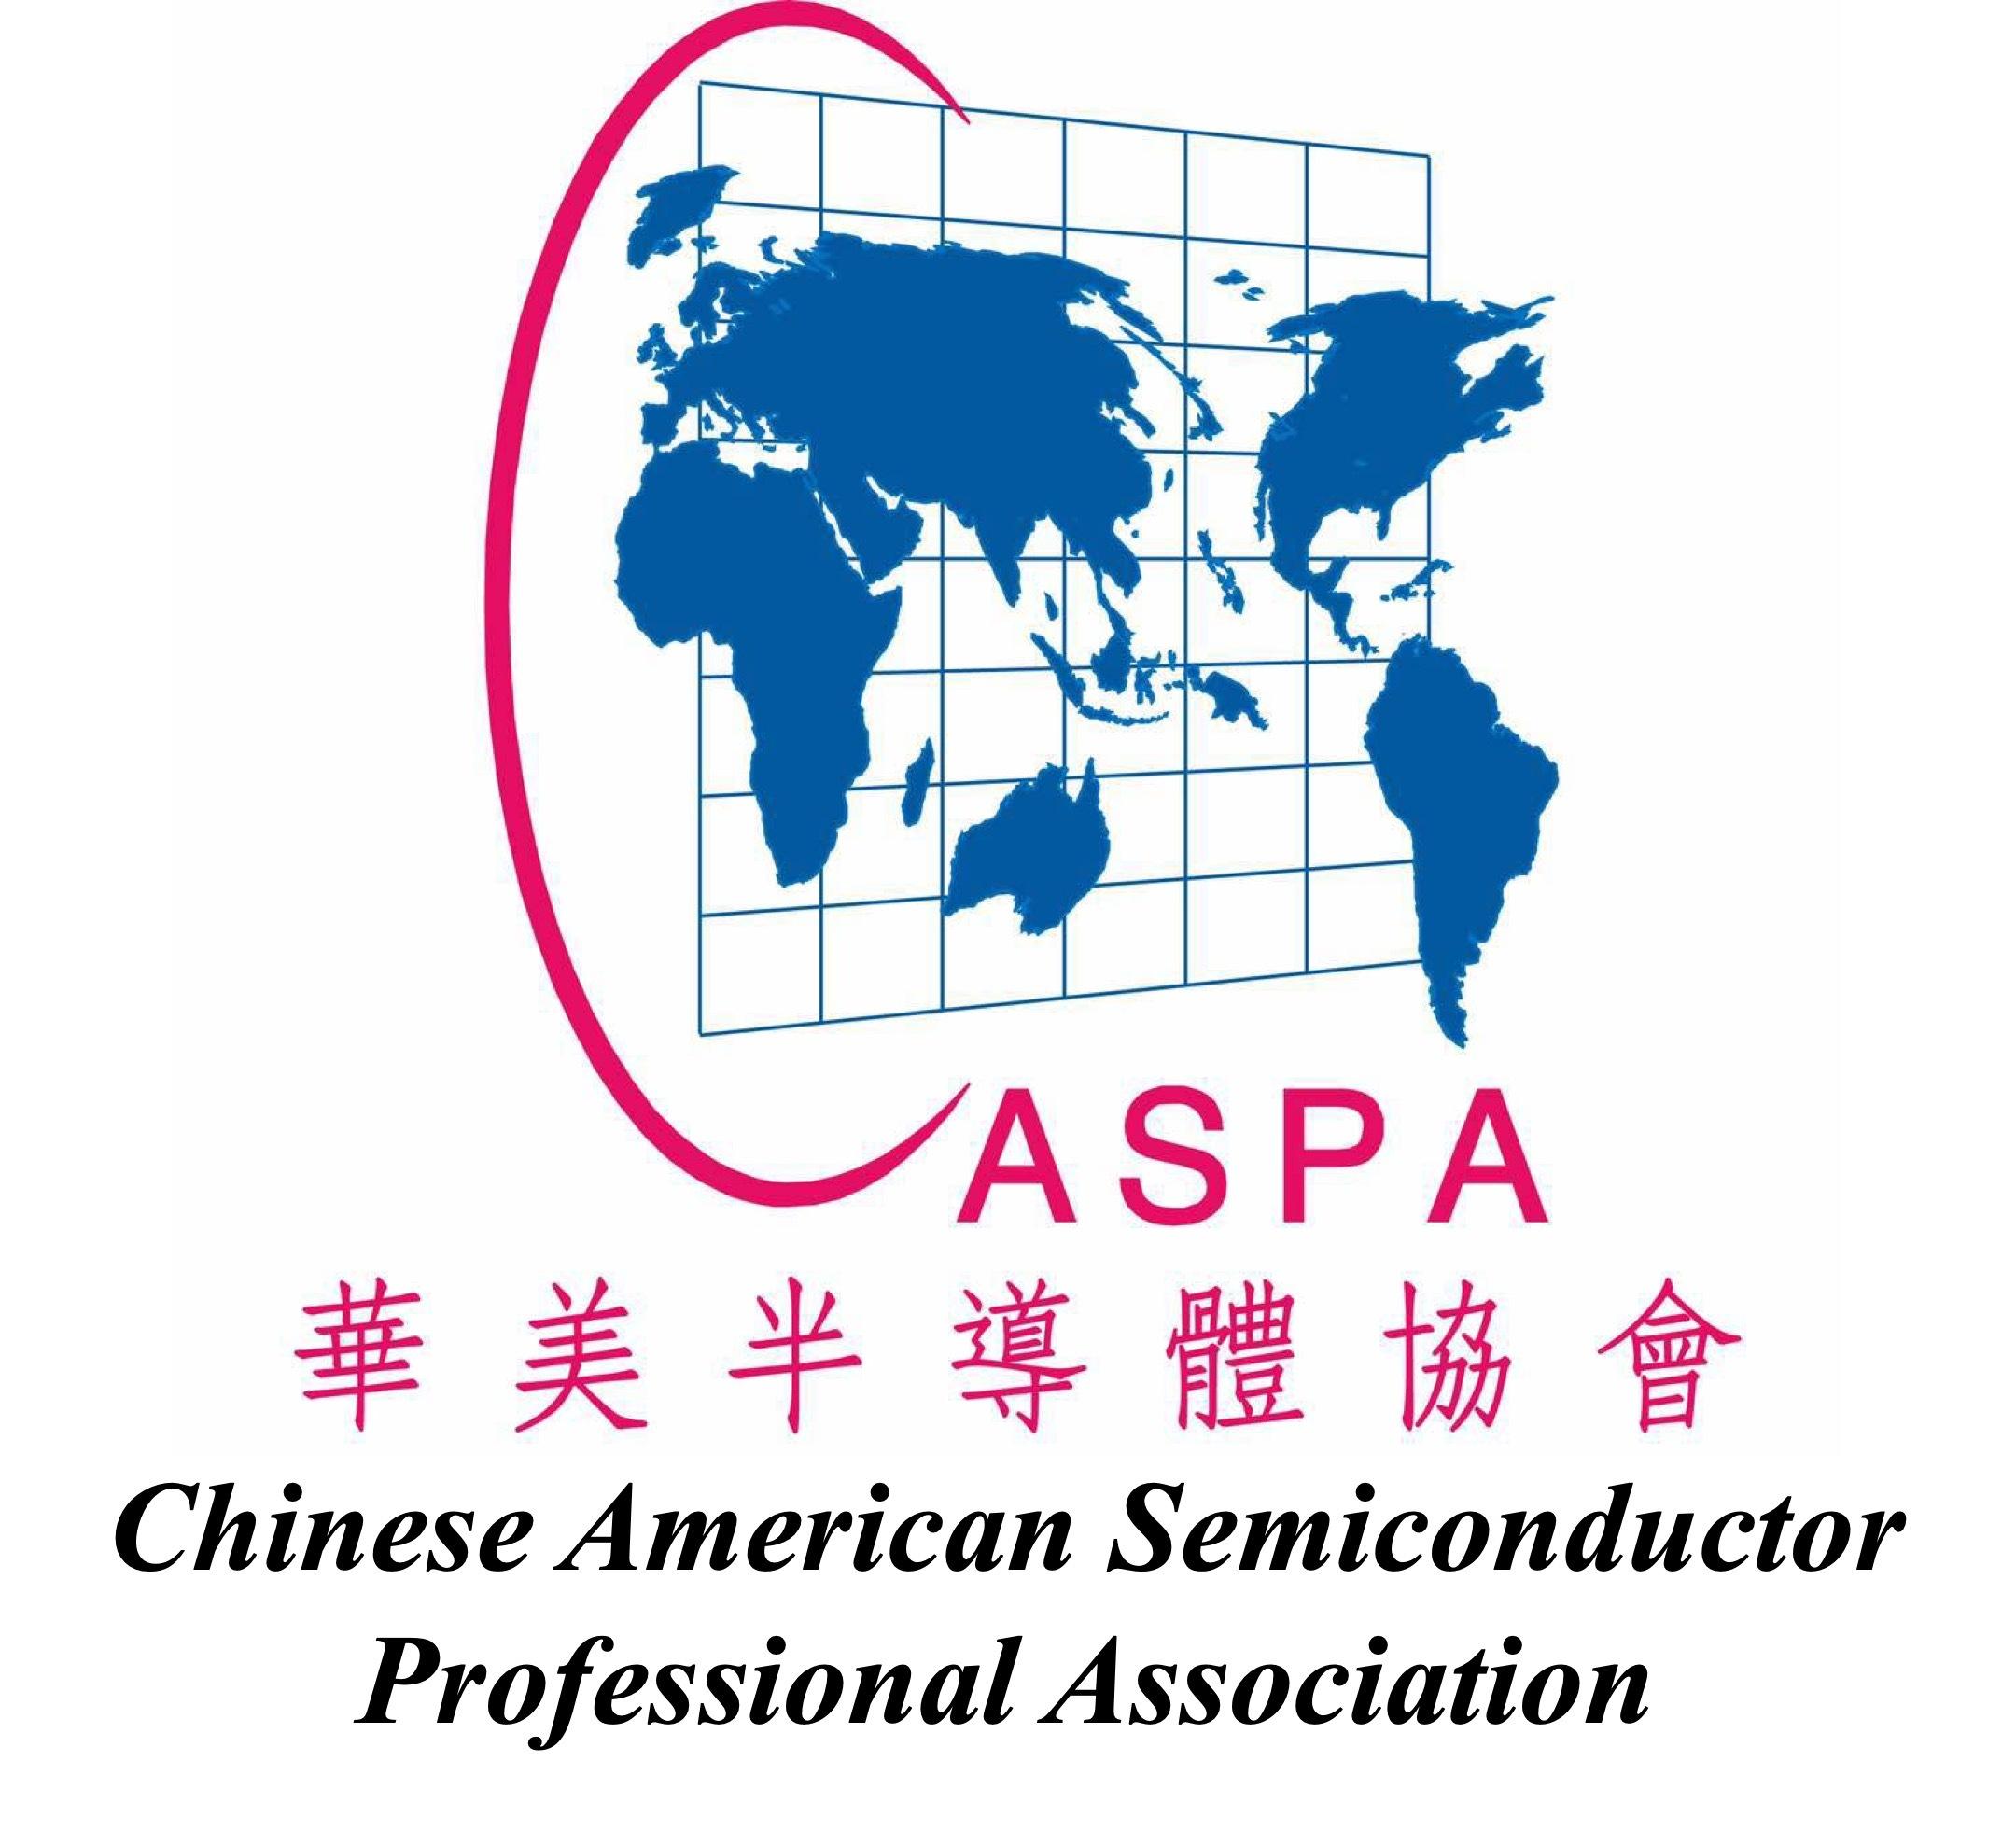 Chinese American Semiconductor Professional Organization